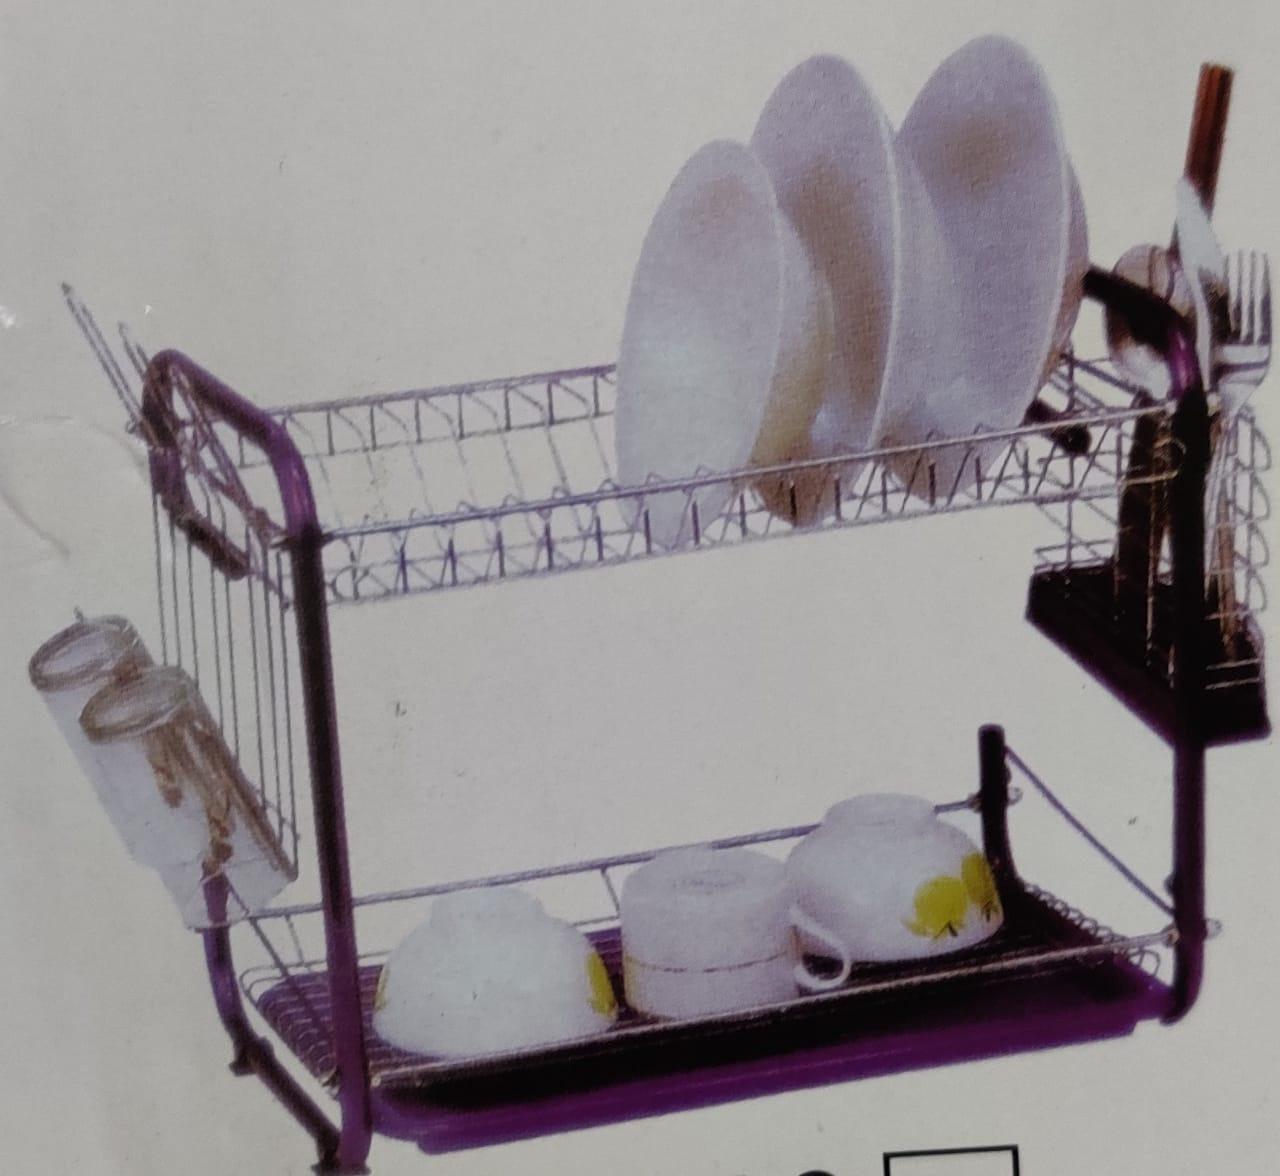 dish rack 2 layer jc 1608 purple